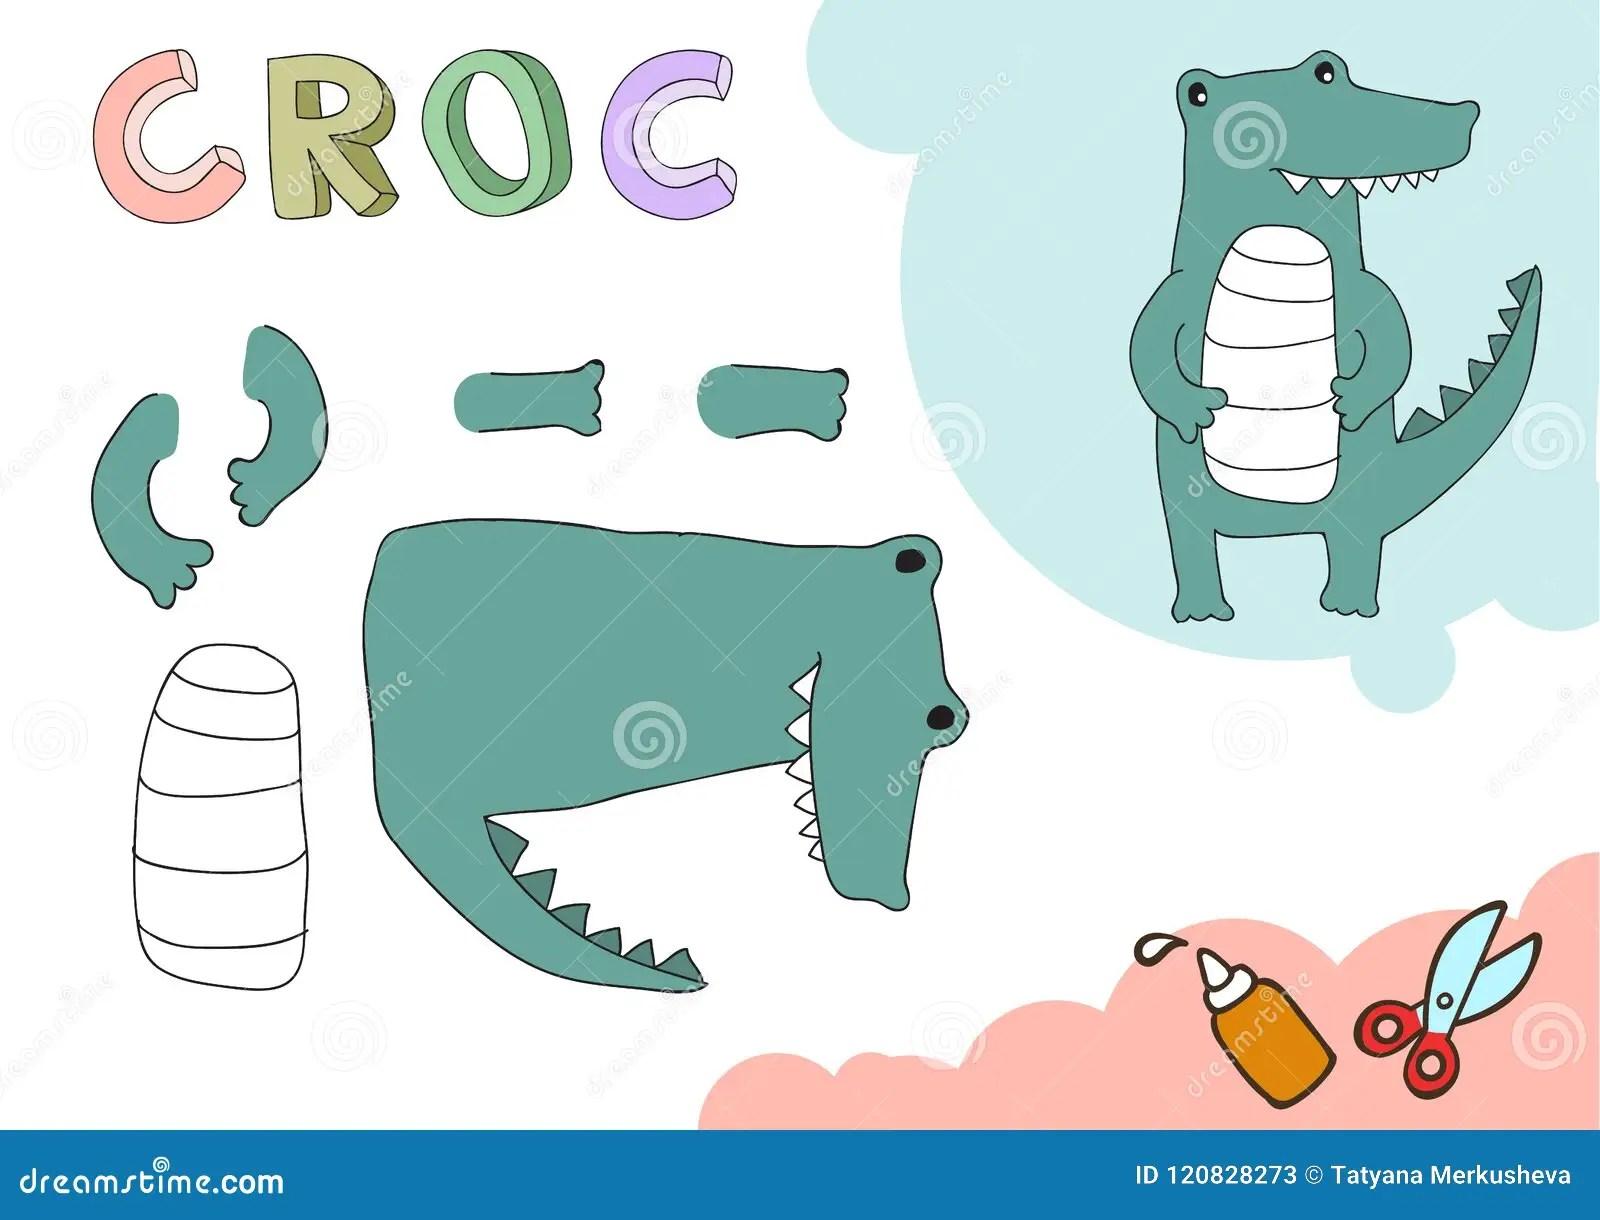 Funny Croc Paper Model Small Home Craft Project Diy